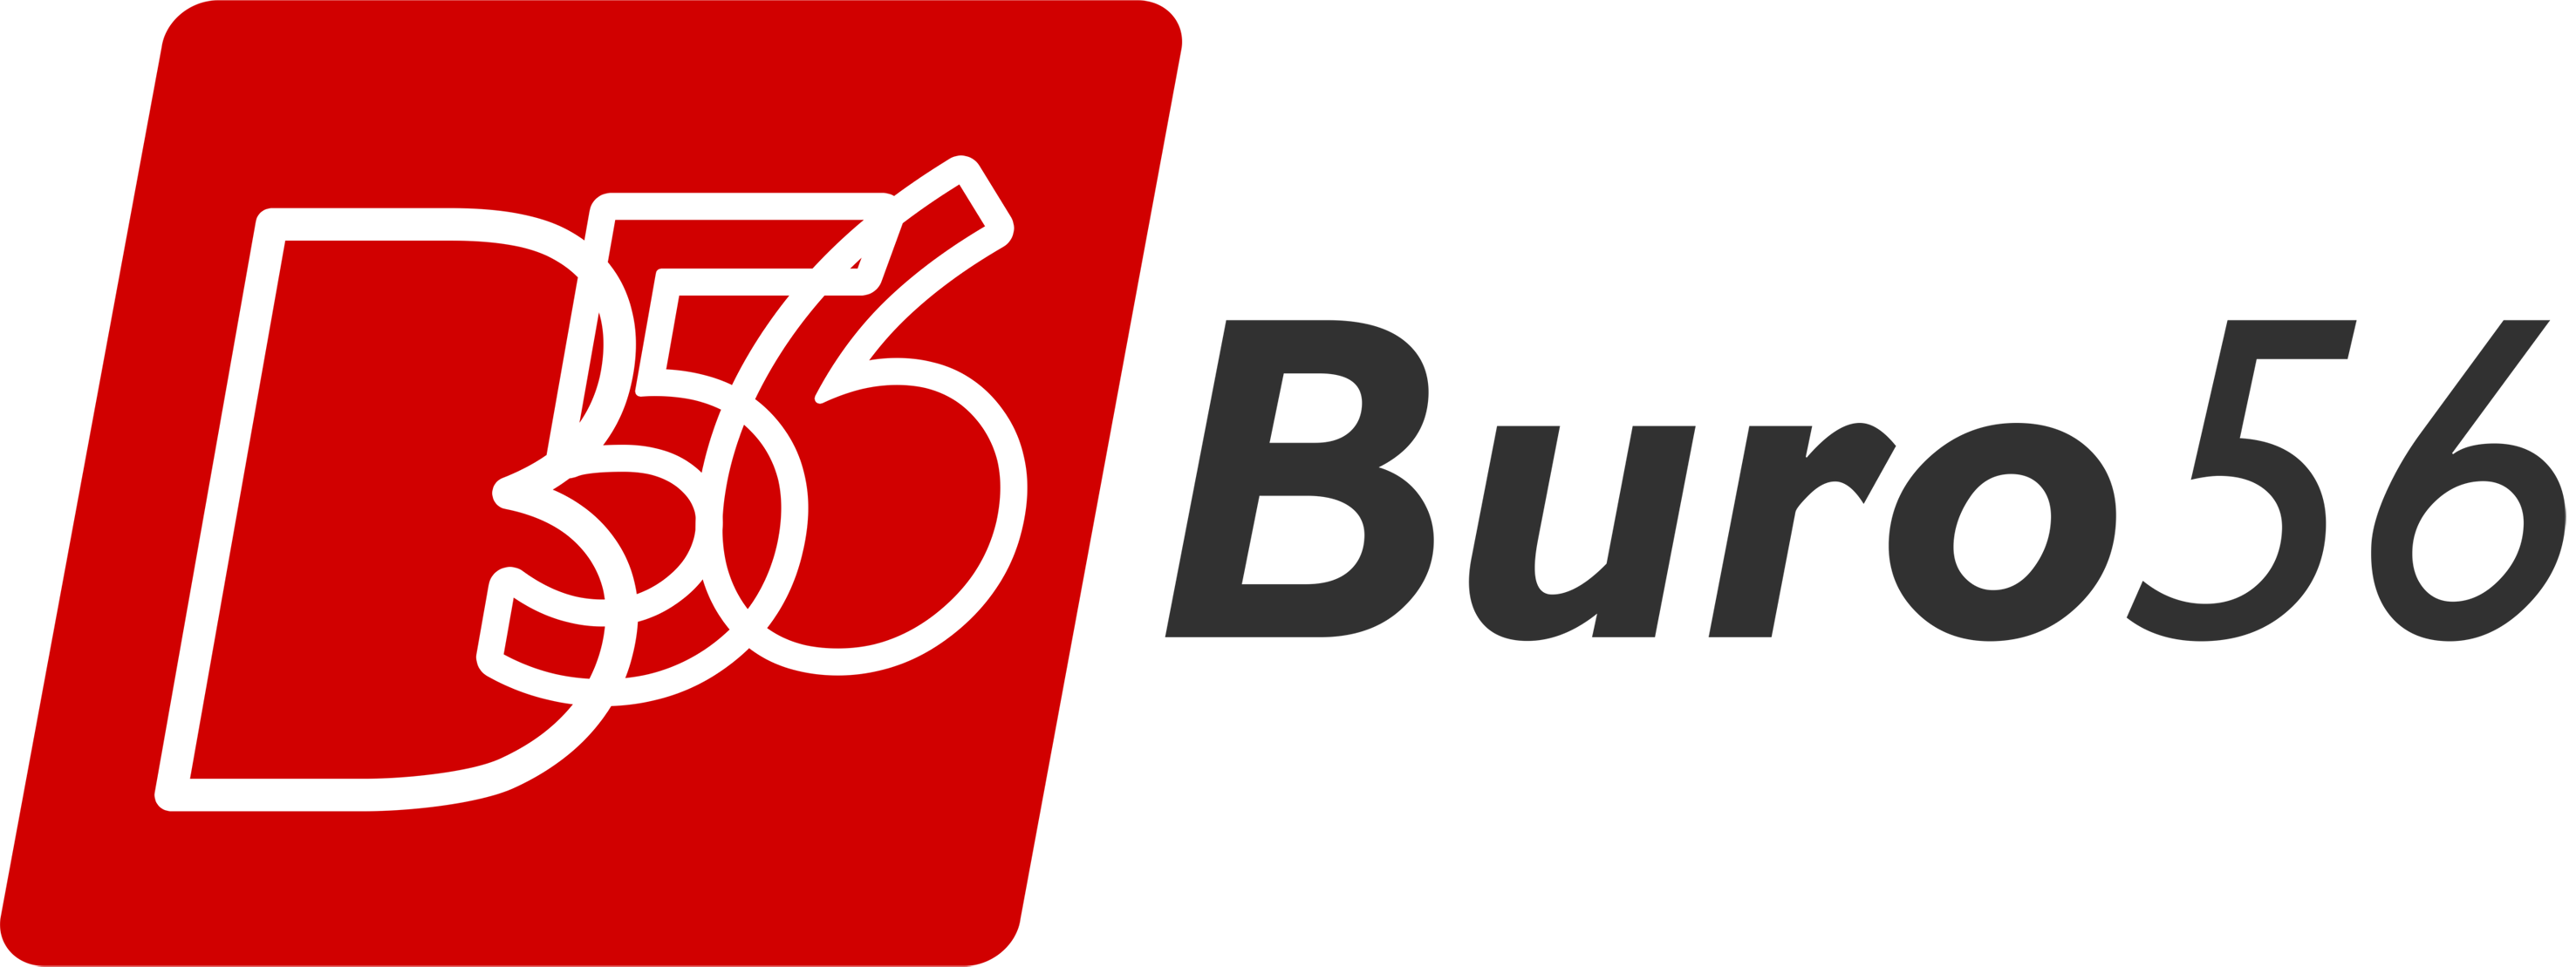 Buro 56 majuscule for Buro 56 lorient